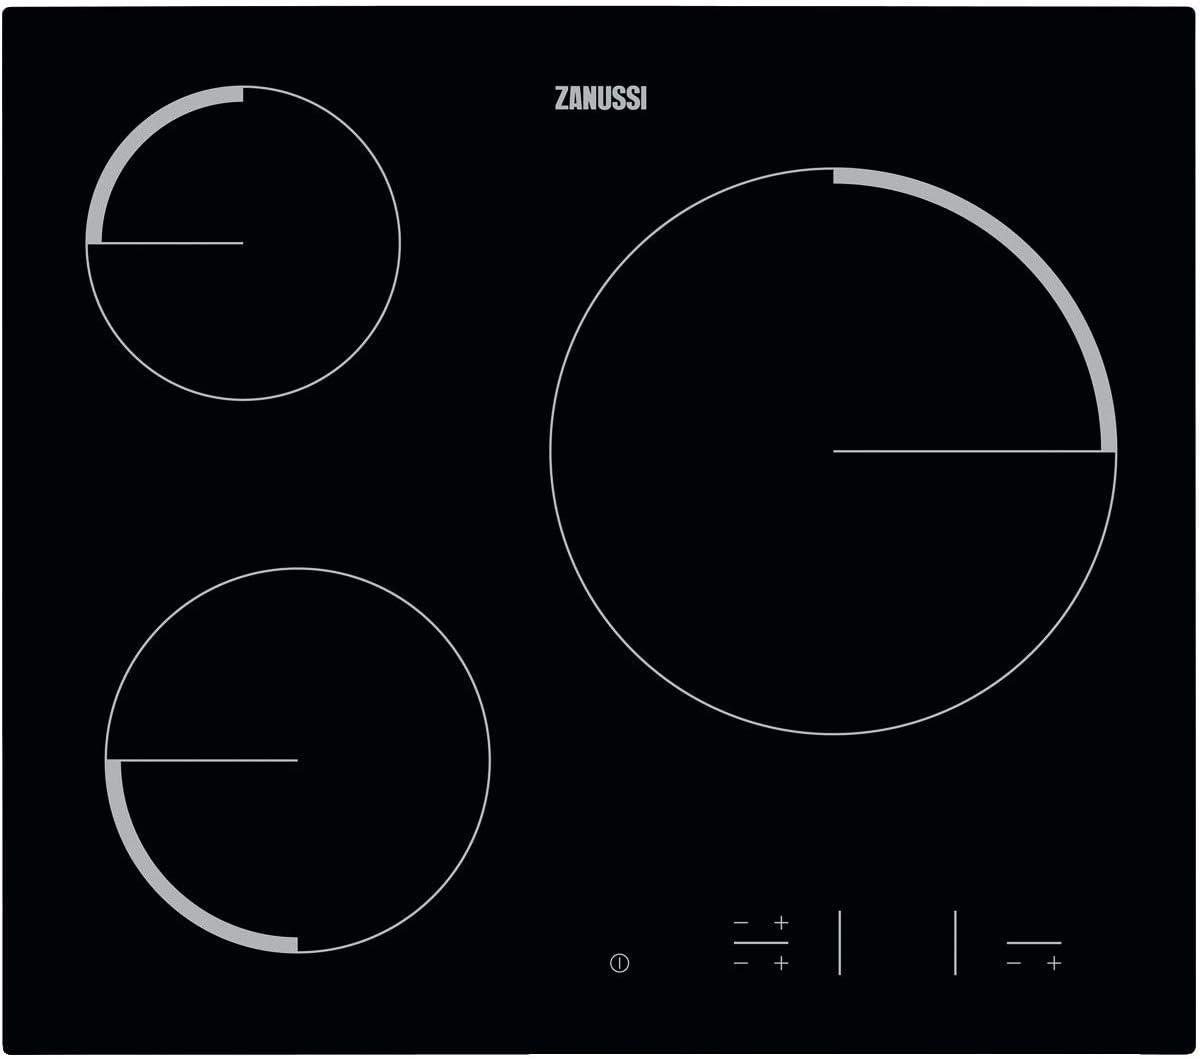 Zanussi ZEV6330FBA Placa vitrocerámica, Biselada, 3 zonas de ...